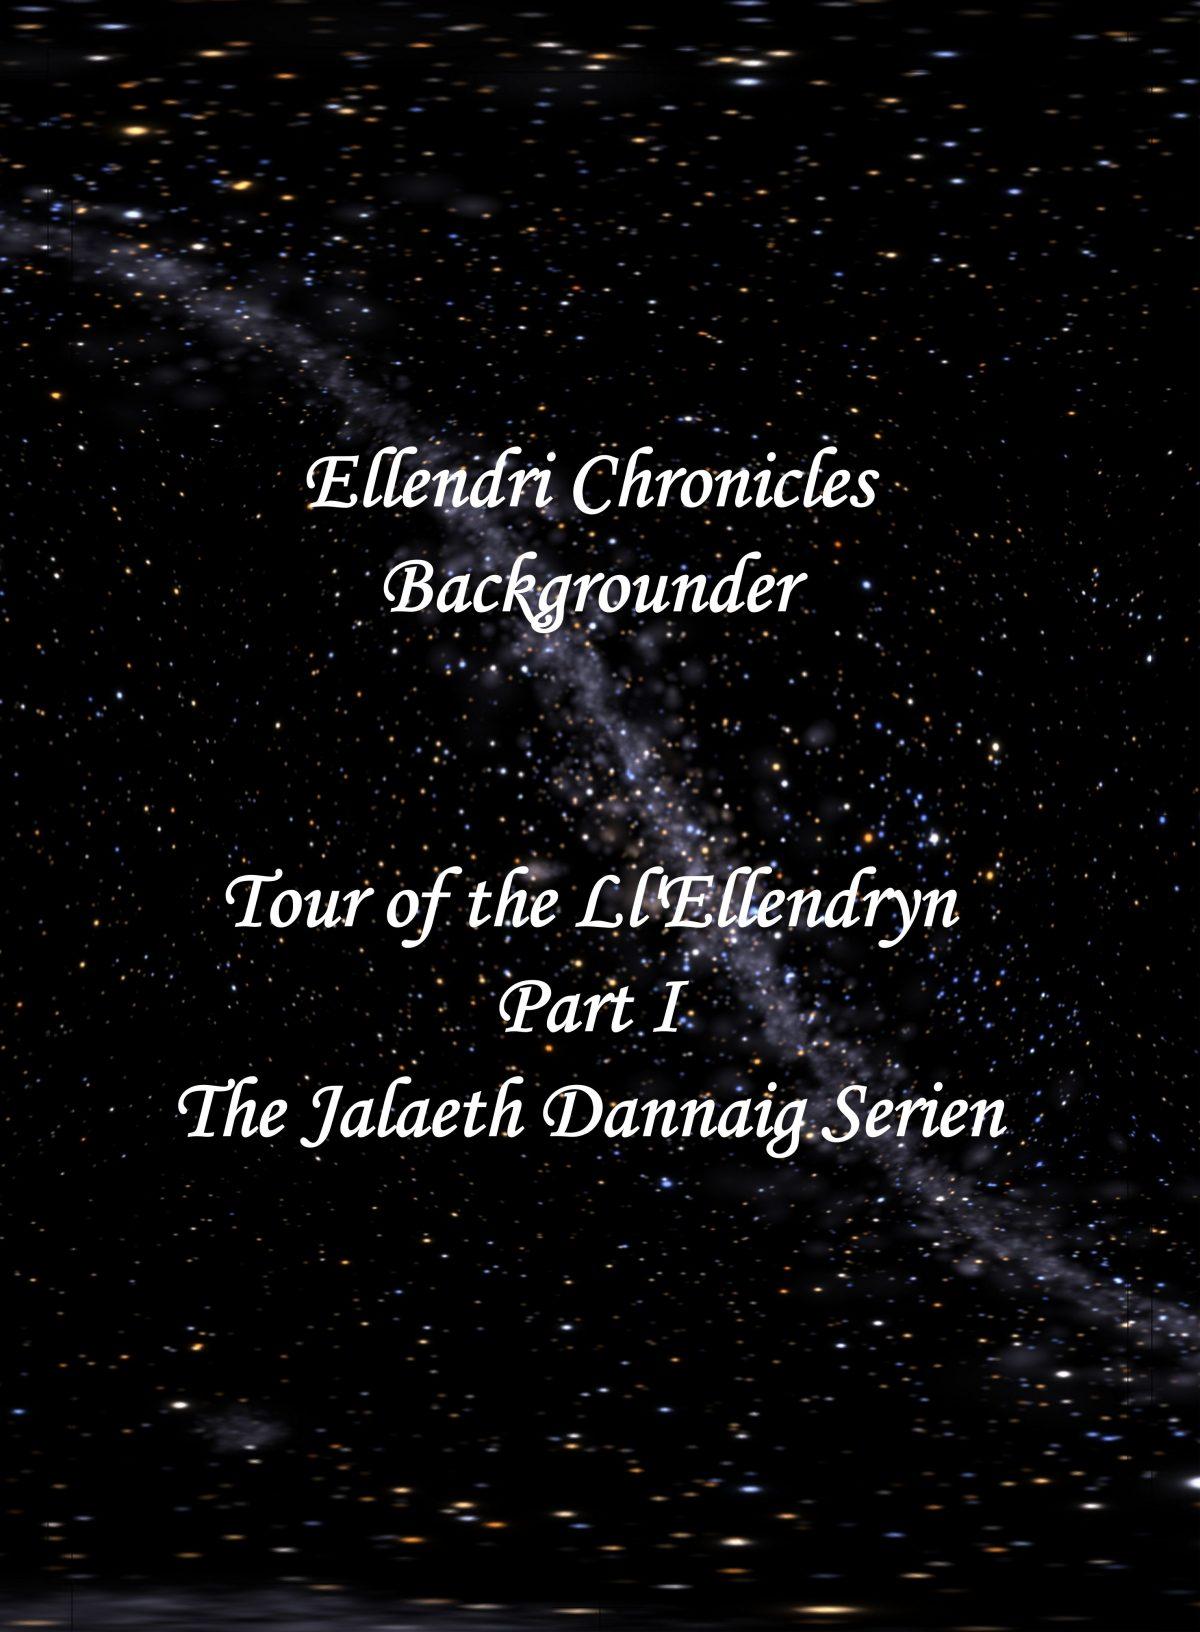 Ellendri Chronicles Backgrounder Part I